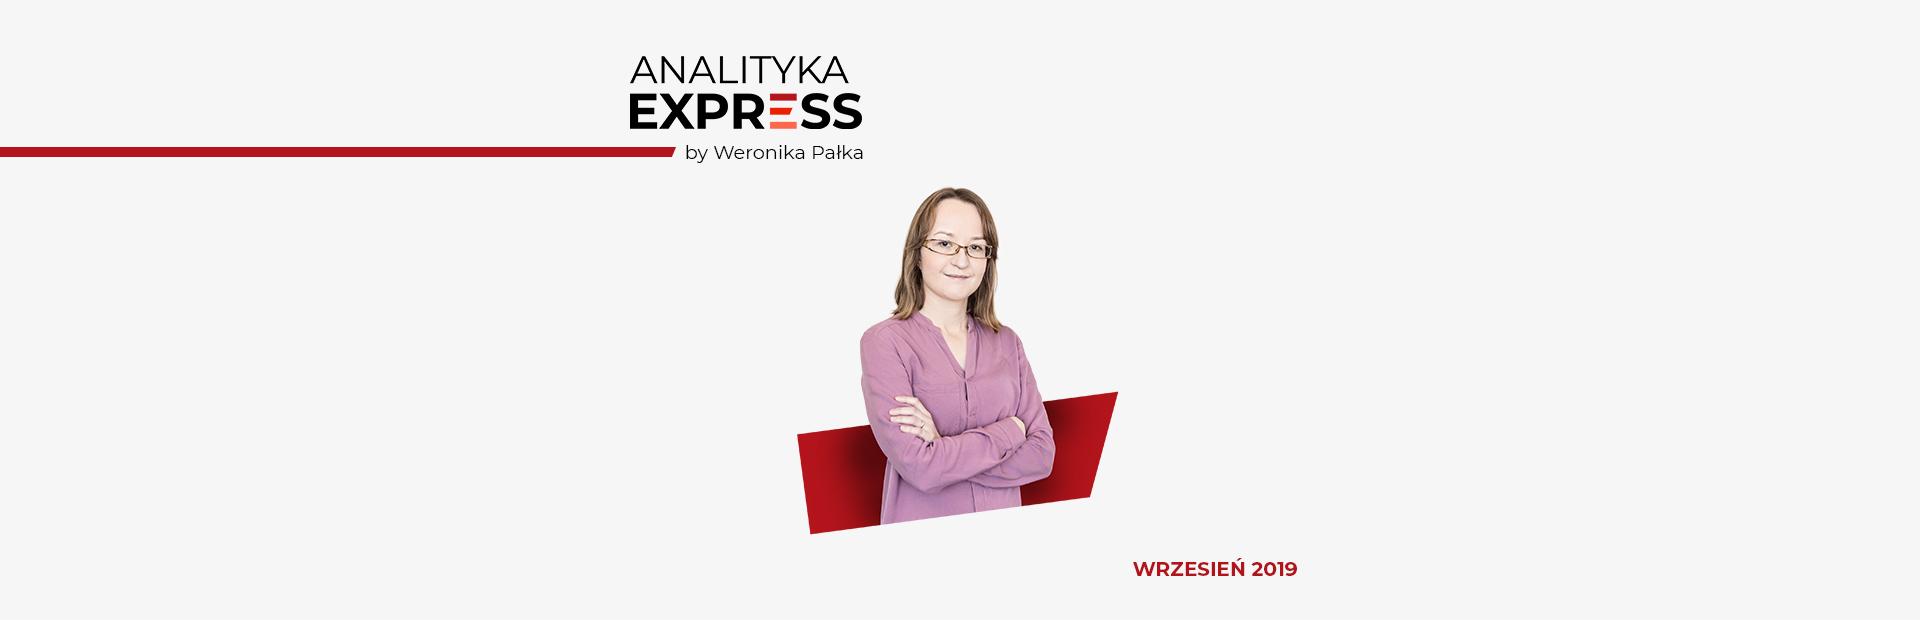 Analityka Express 9/2019